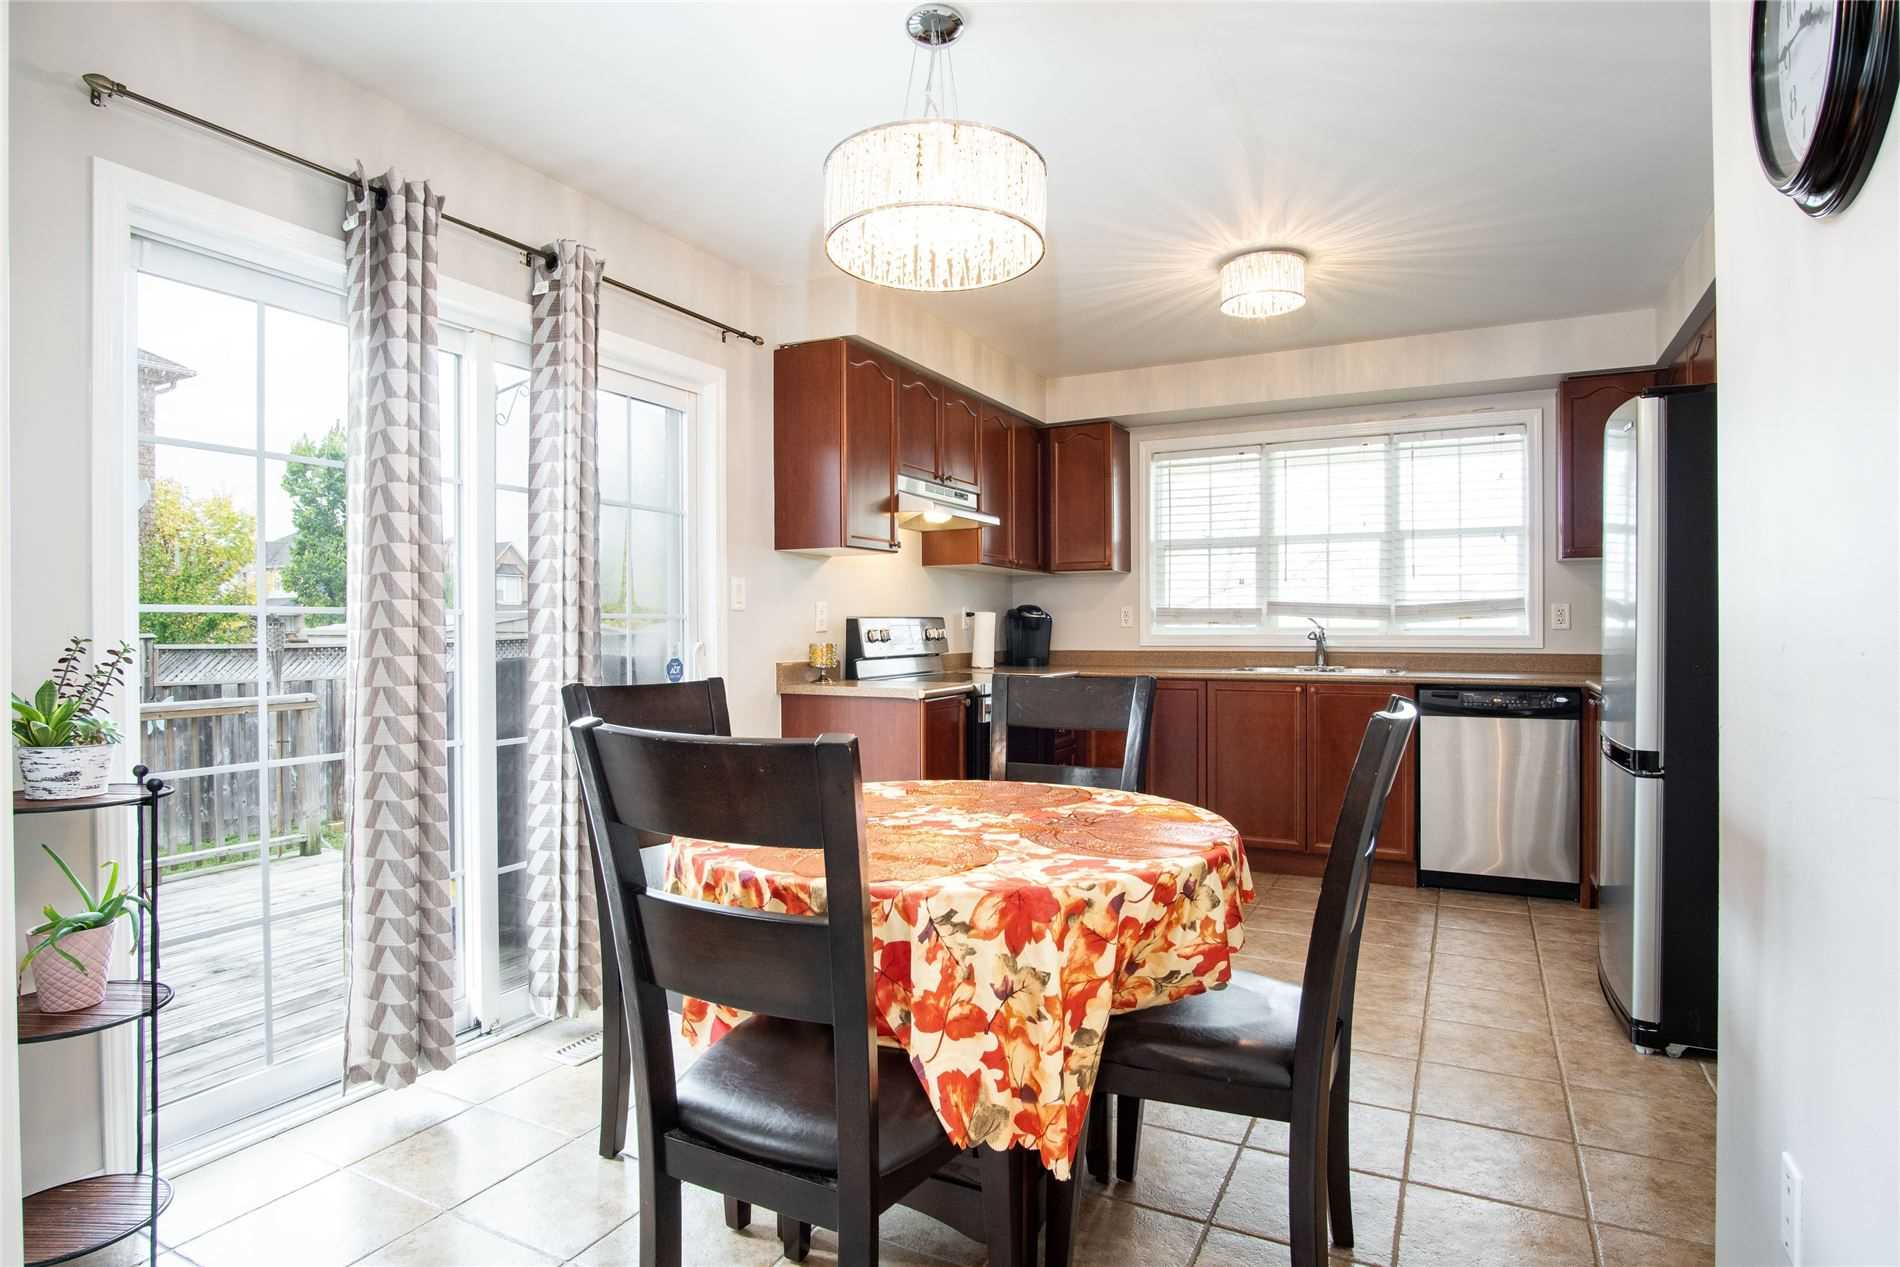 827 Biggar Hts - Coates Detached for sale, 4 Bedrooms (W5400280) - #12